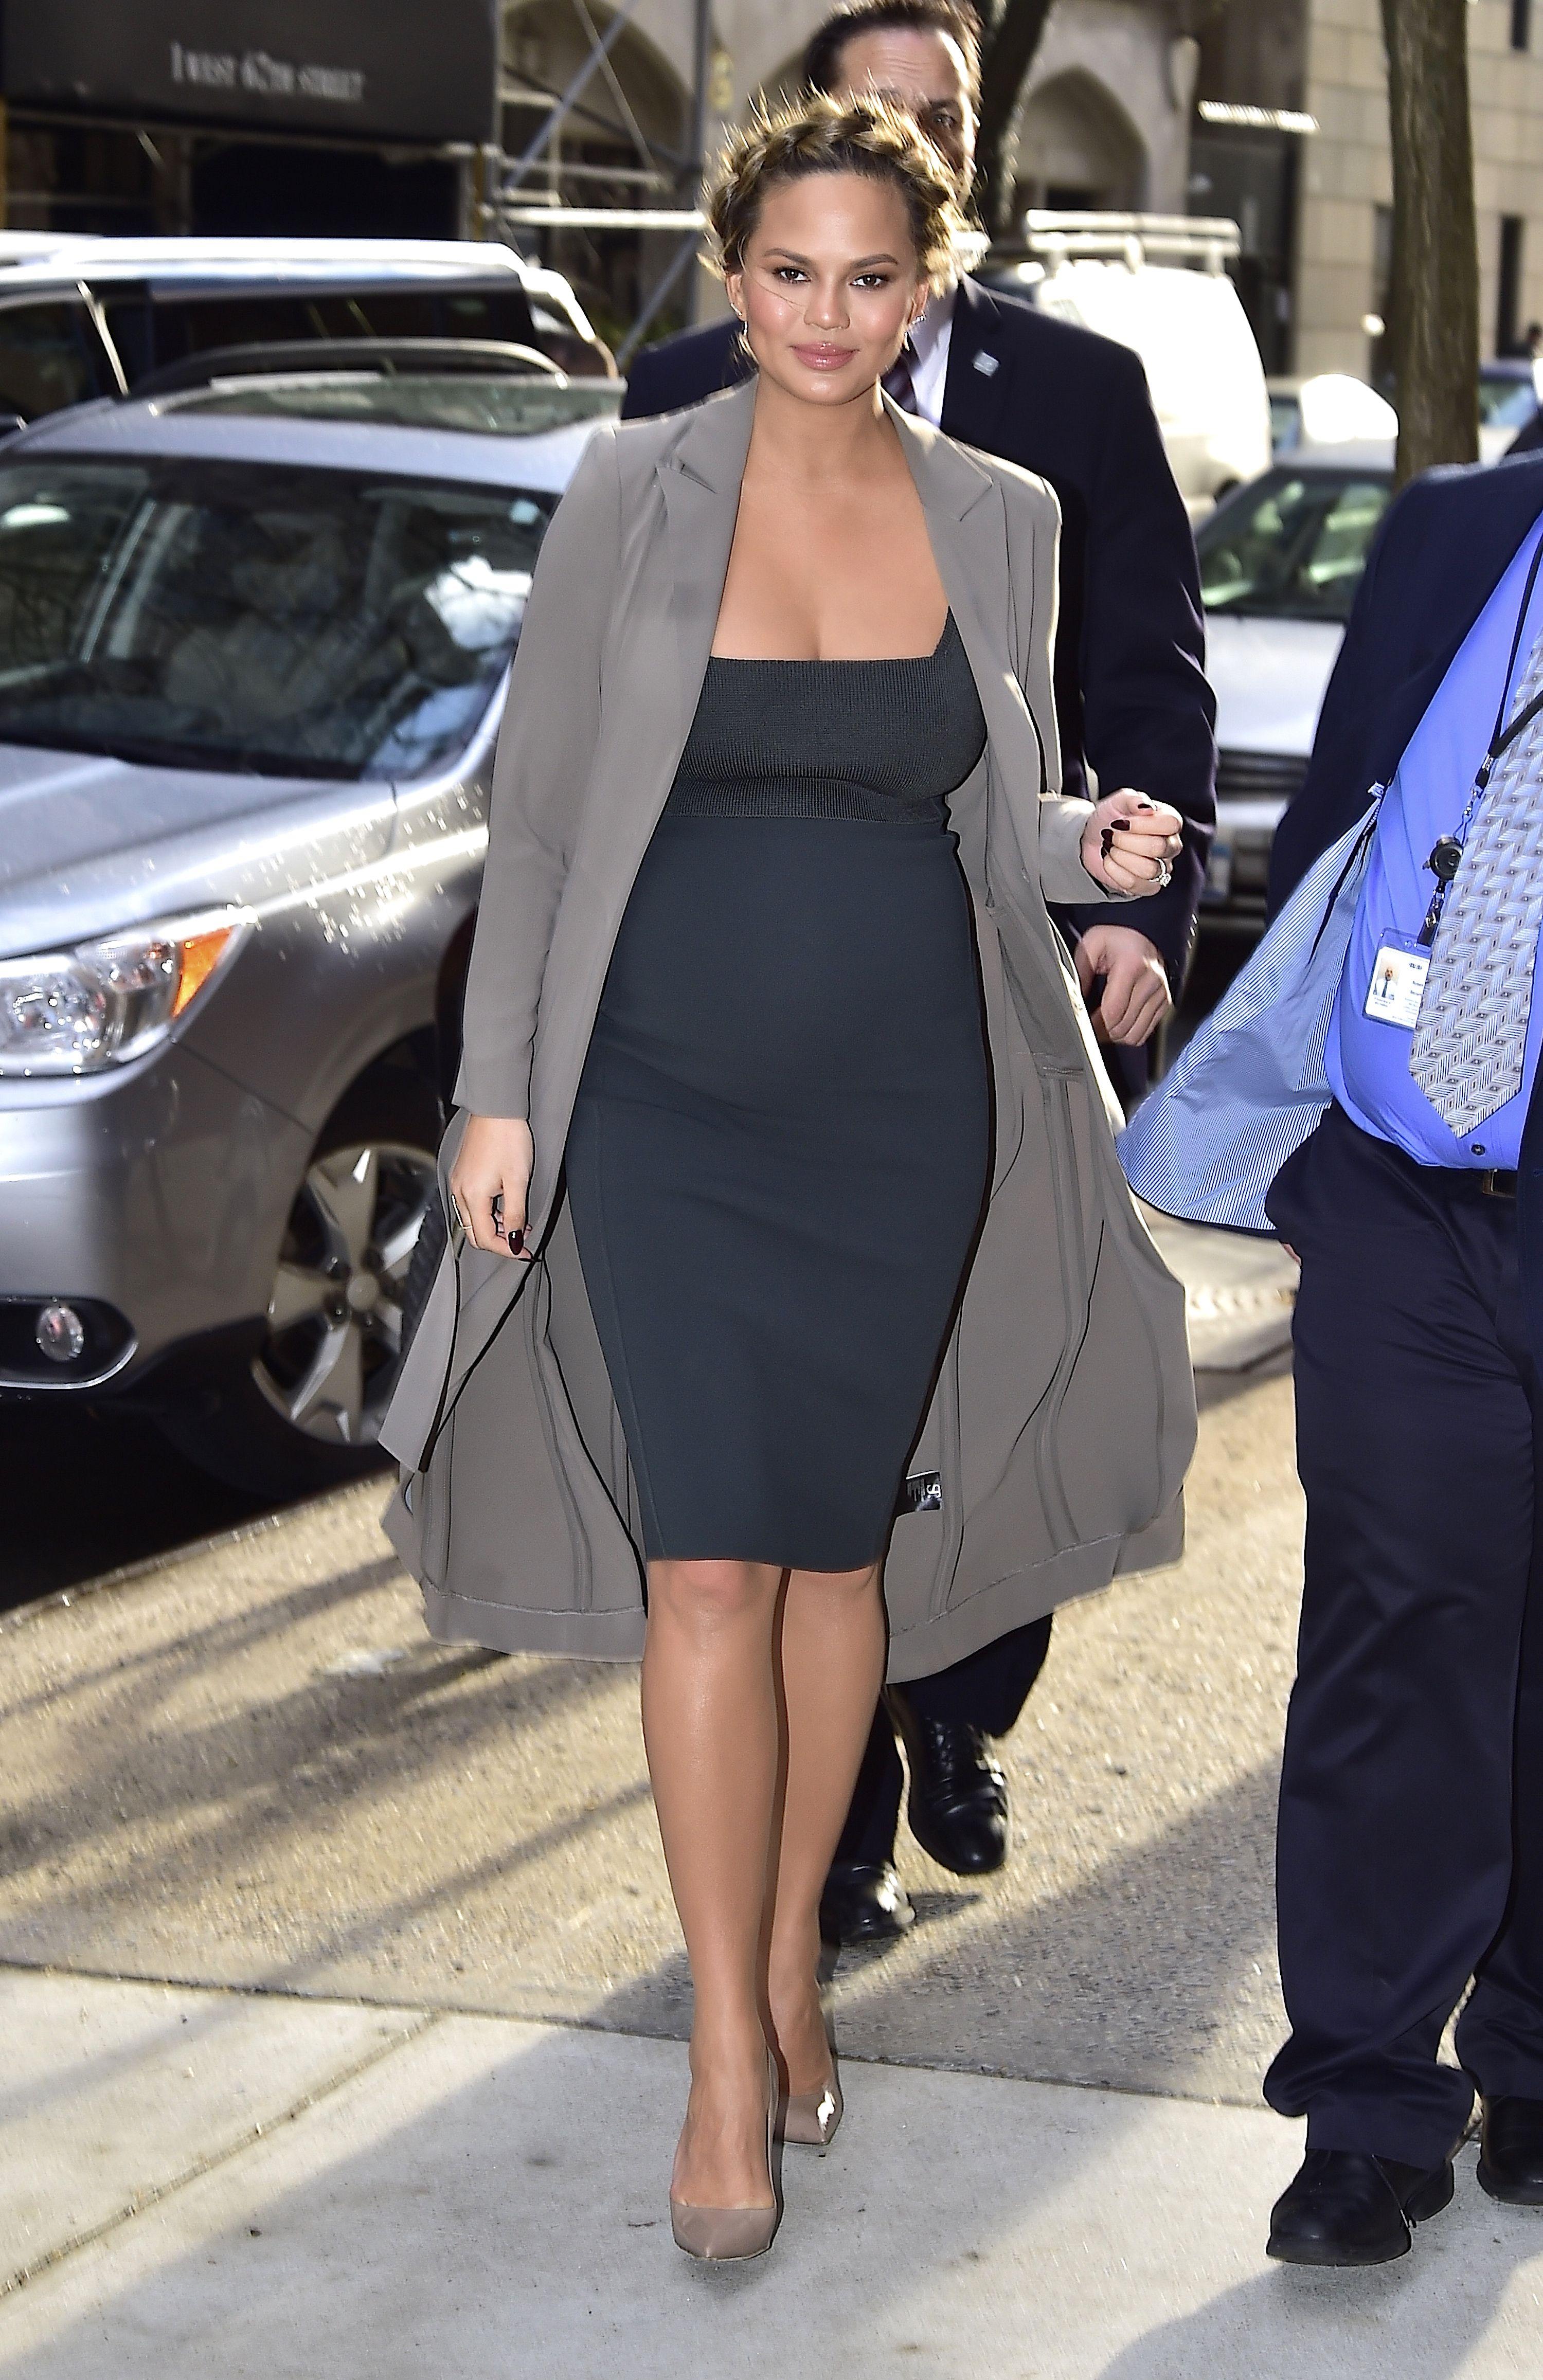 Chrissy teigen borrows kim kardashians maternity uniform chrissy teigen borrows kim kardashians maternity uniform chrissy teigen pregnancy style ombrellifo Images